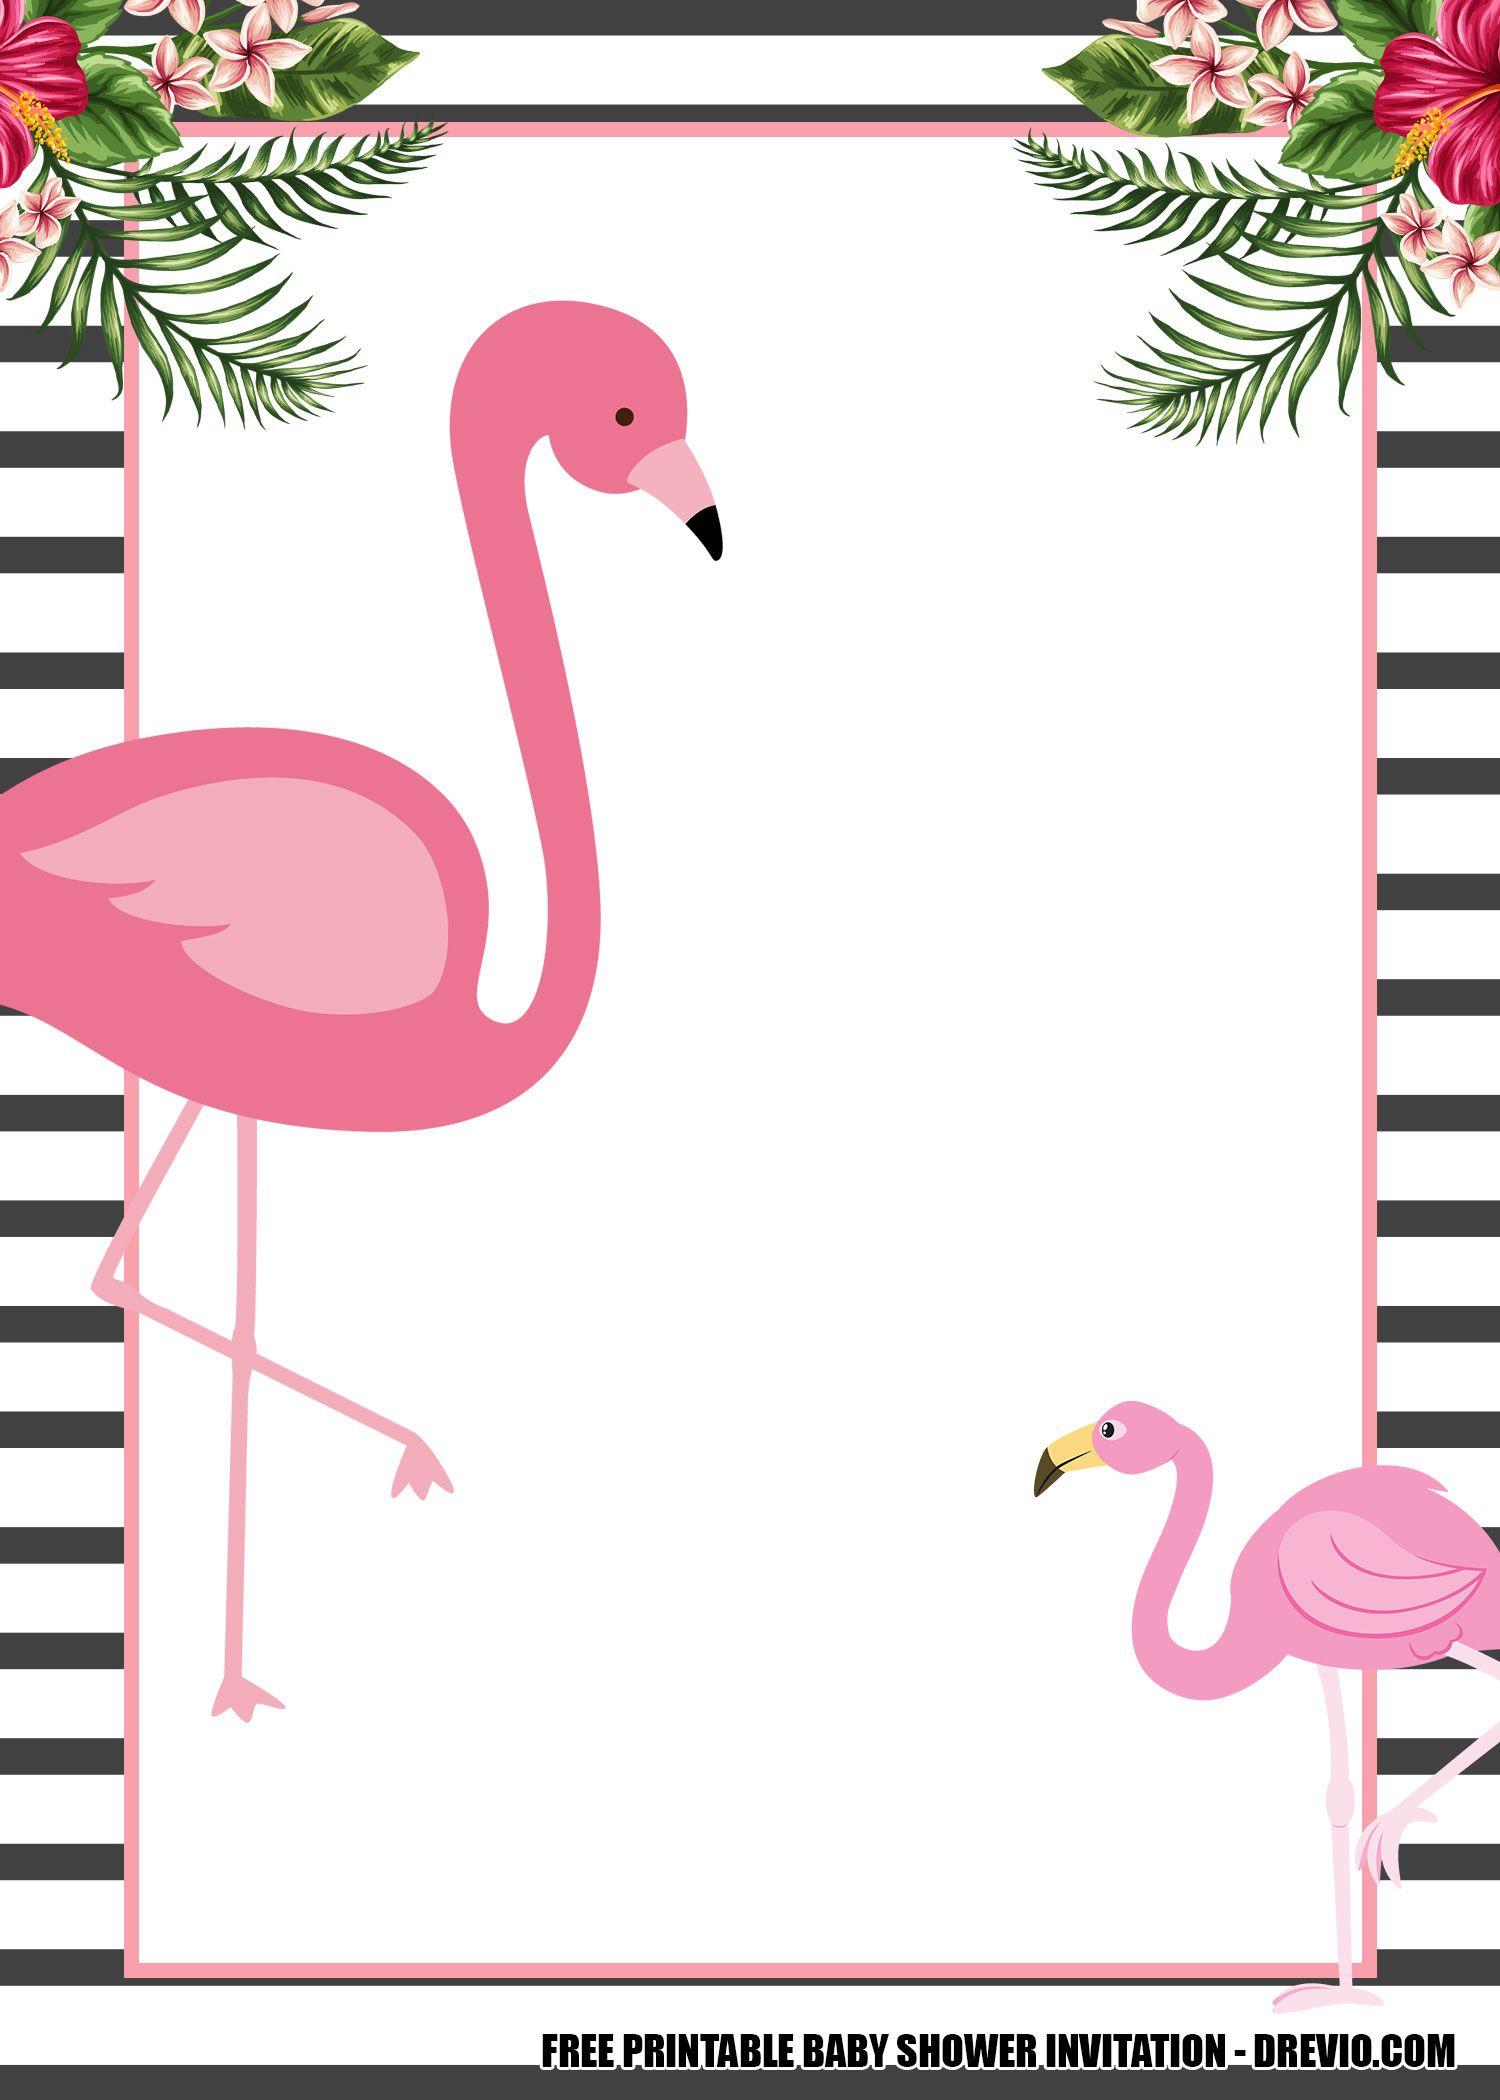 16 Free Flamingo Invitations Templates Downloadable For Any Occasions Flamingo Invitation Free Printable Birthday Invitations Printable Birthday Invitations